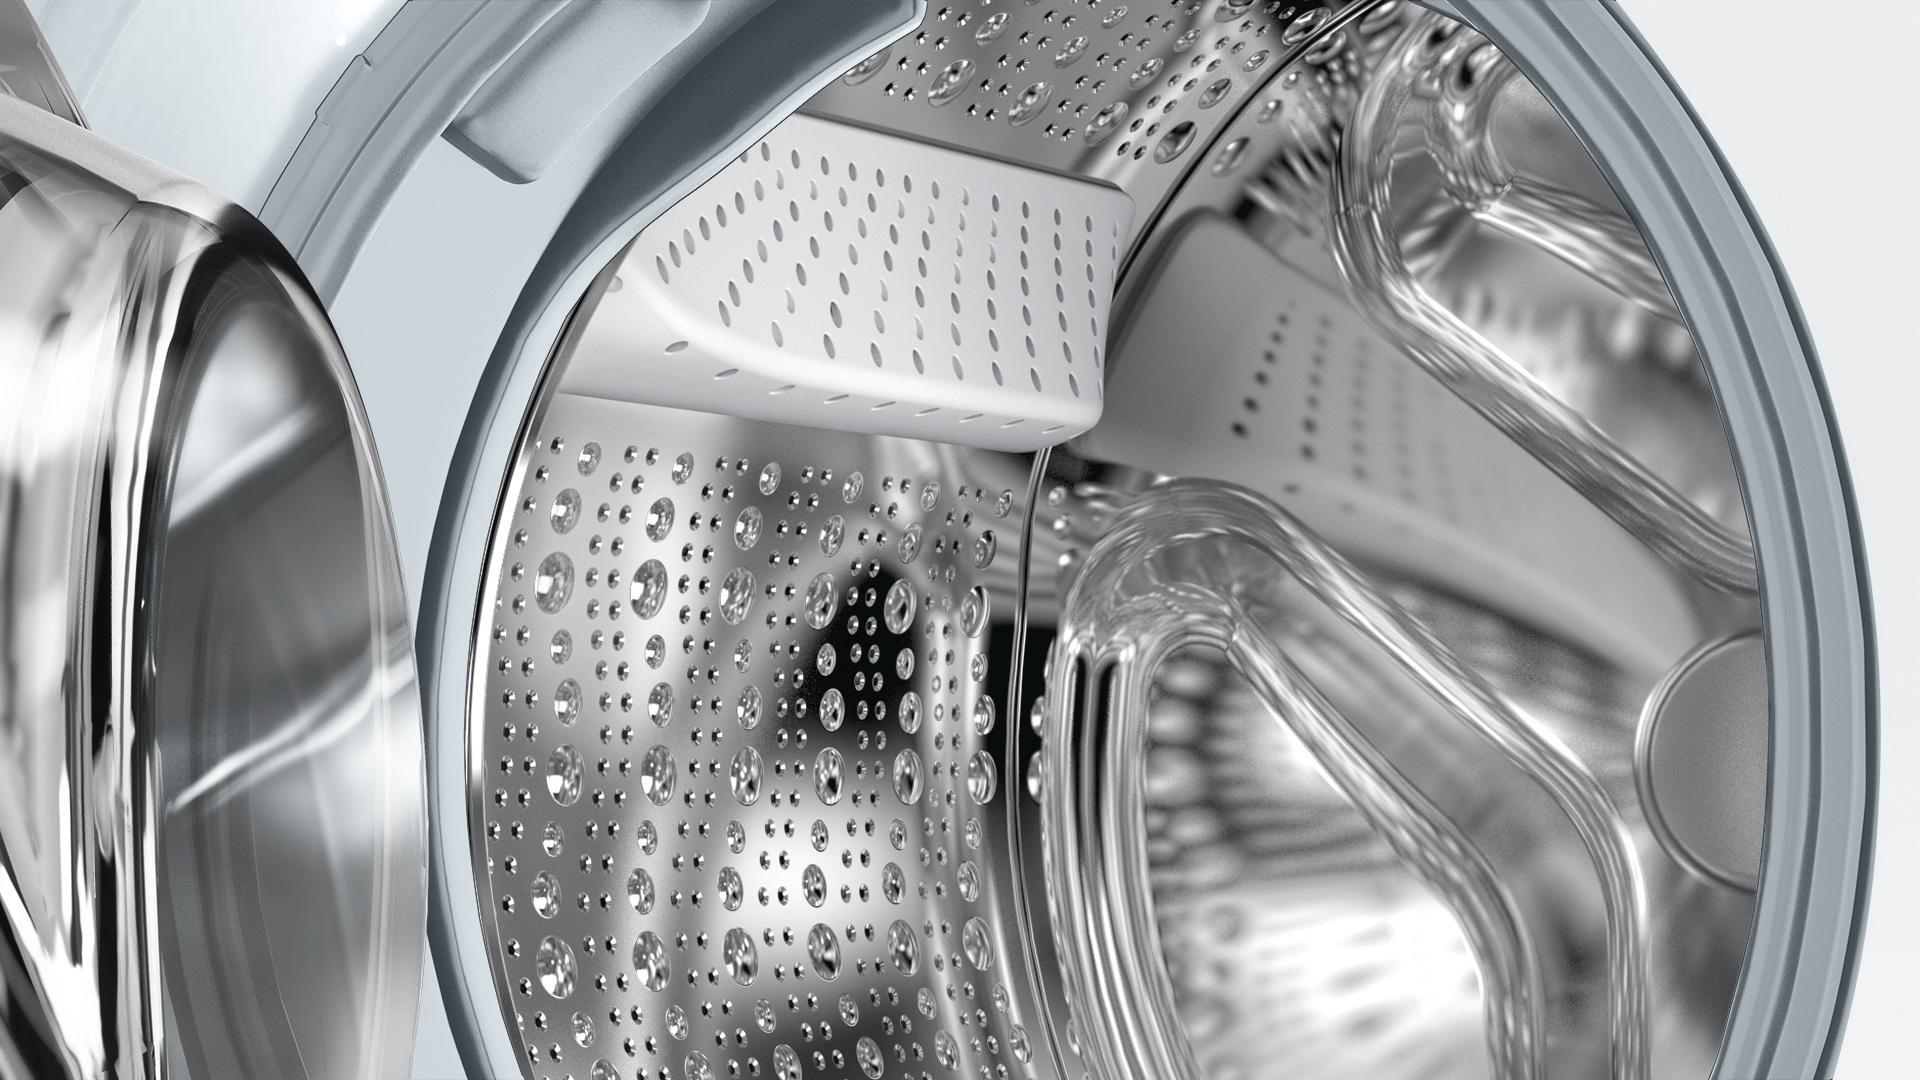 Siemens IDWMH4Y790GB iQ700 Front loading automatic washing machine